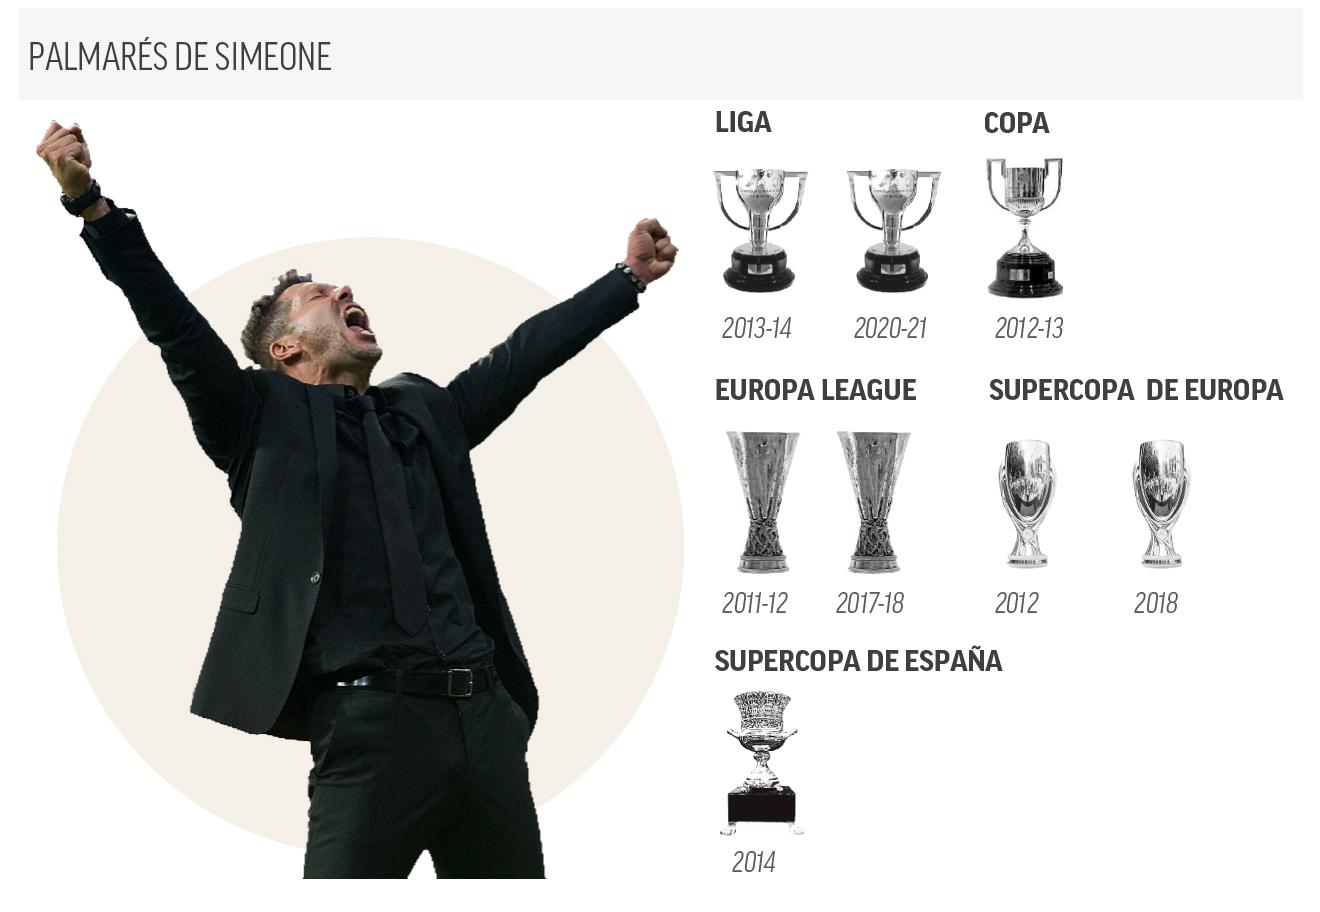 Palmarés Simeone